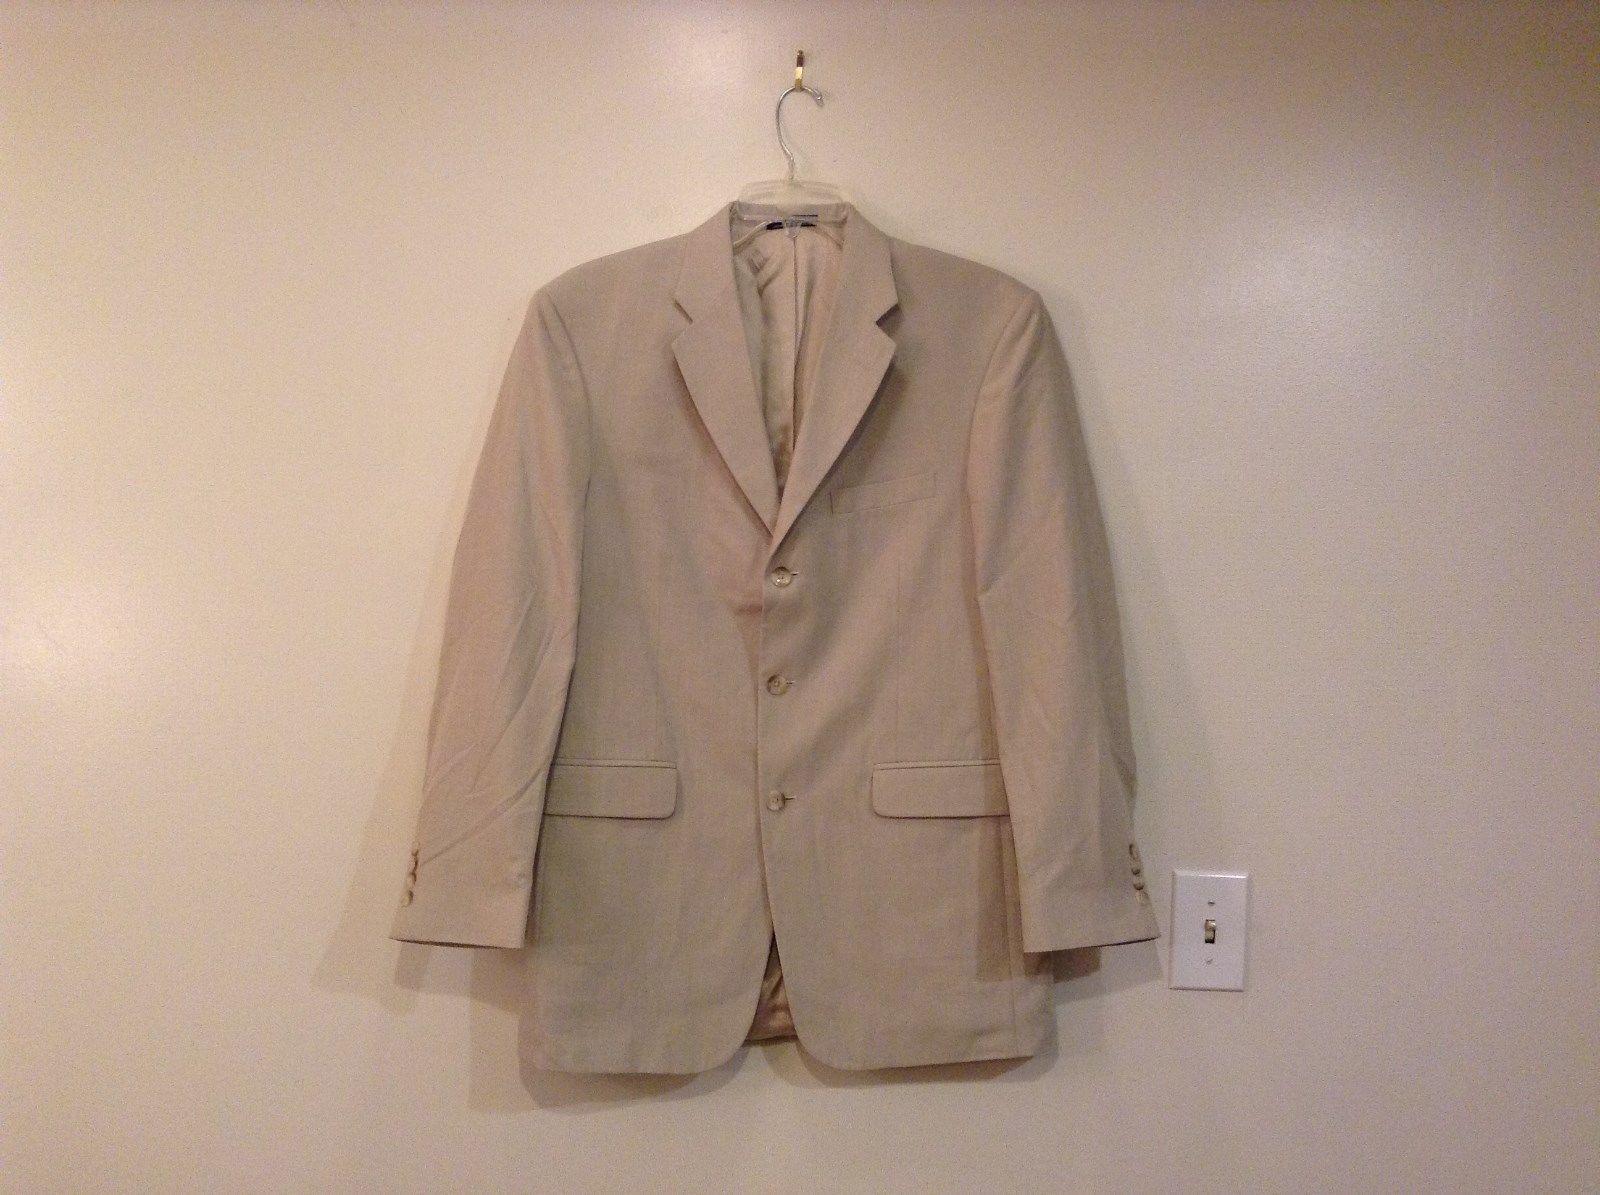 J Ferrar Natural Linen Very Light Gray Lined Suit Jacket Blazer Size 40L